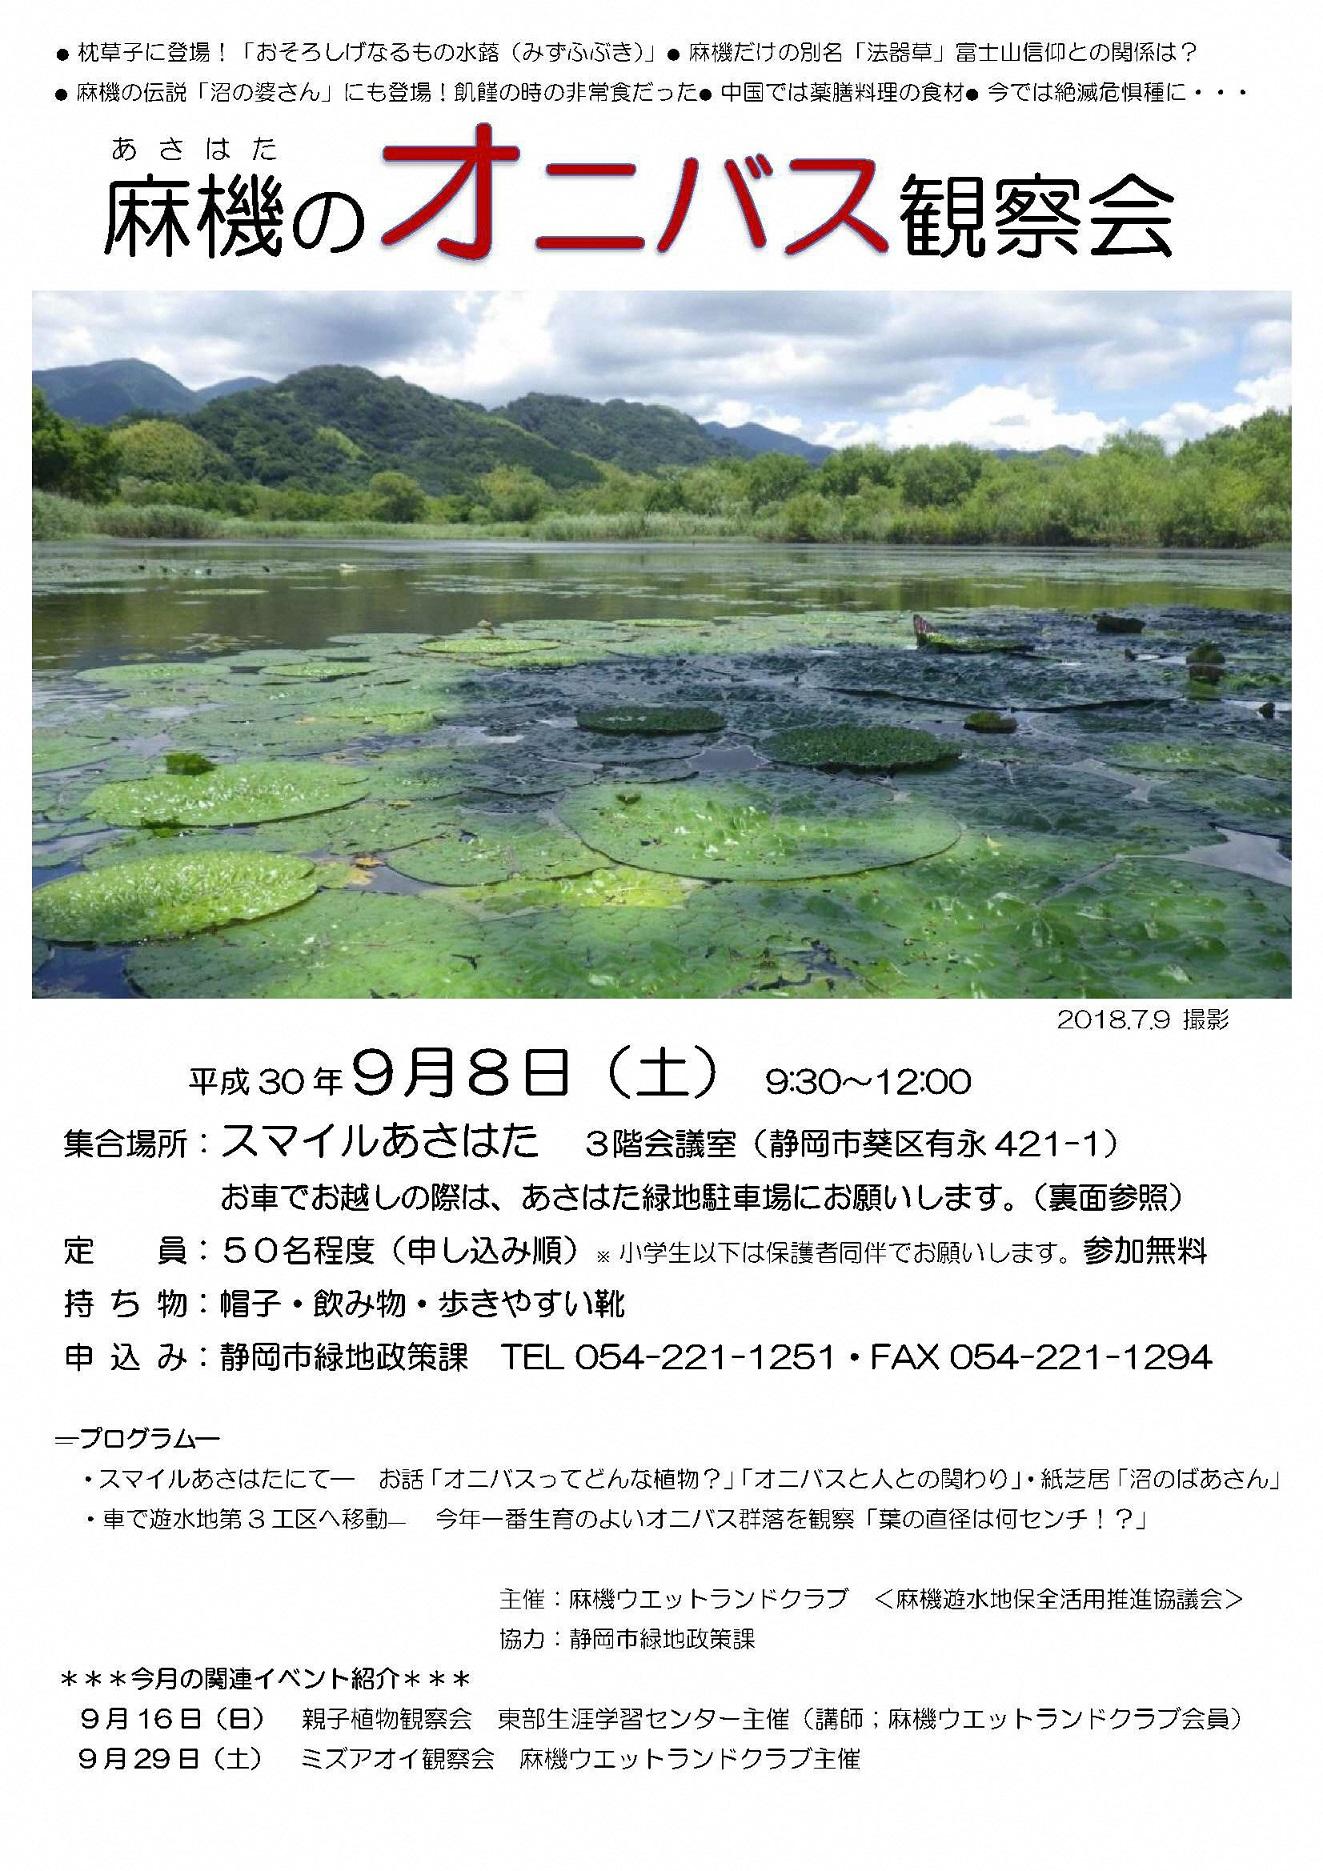 http://www.shizutan.jp/learning/2018/08/08/images/H30%E3%82%AA%E3%83%8B%E3%83%90%E3%82%B9%E3%83%81%E3%83%A9%E3%82%B7-1.jpg